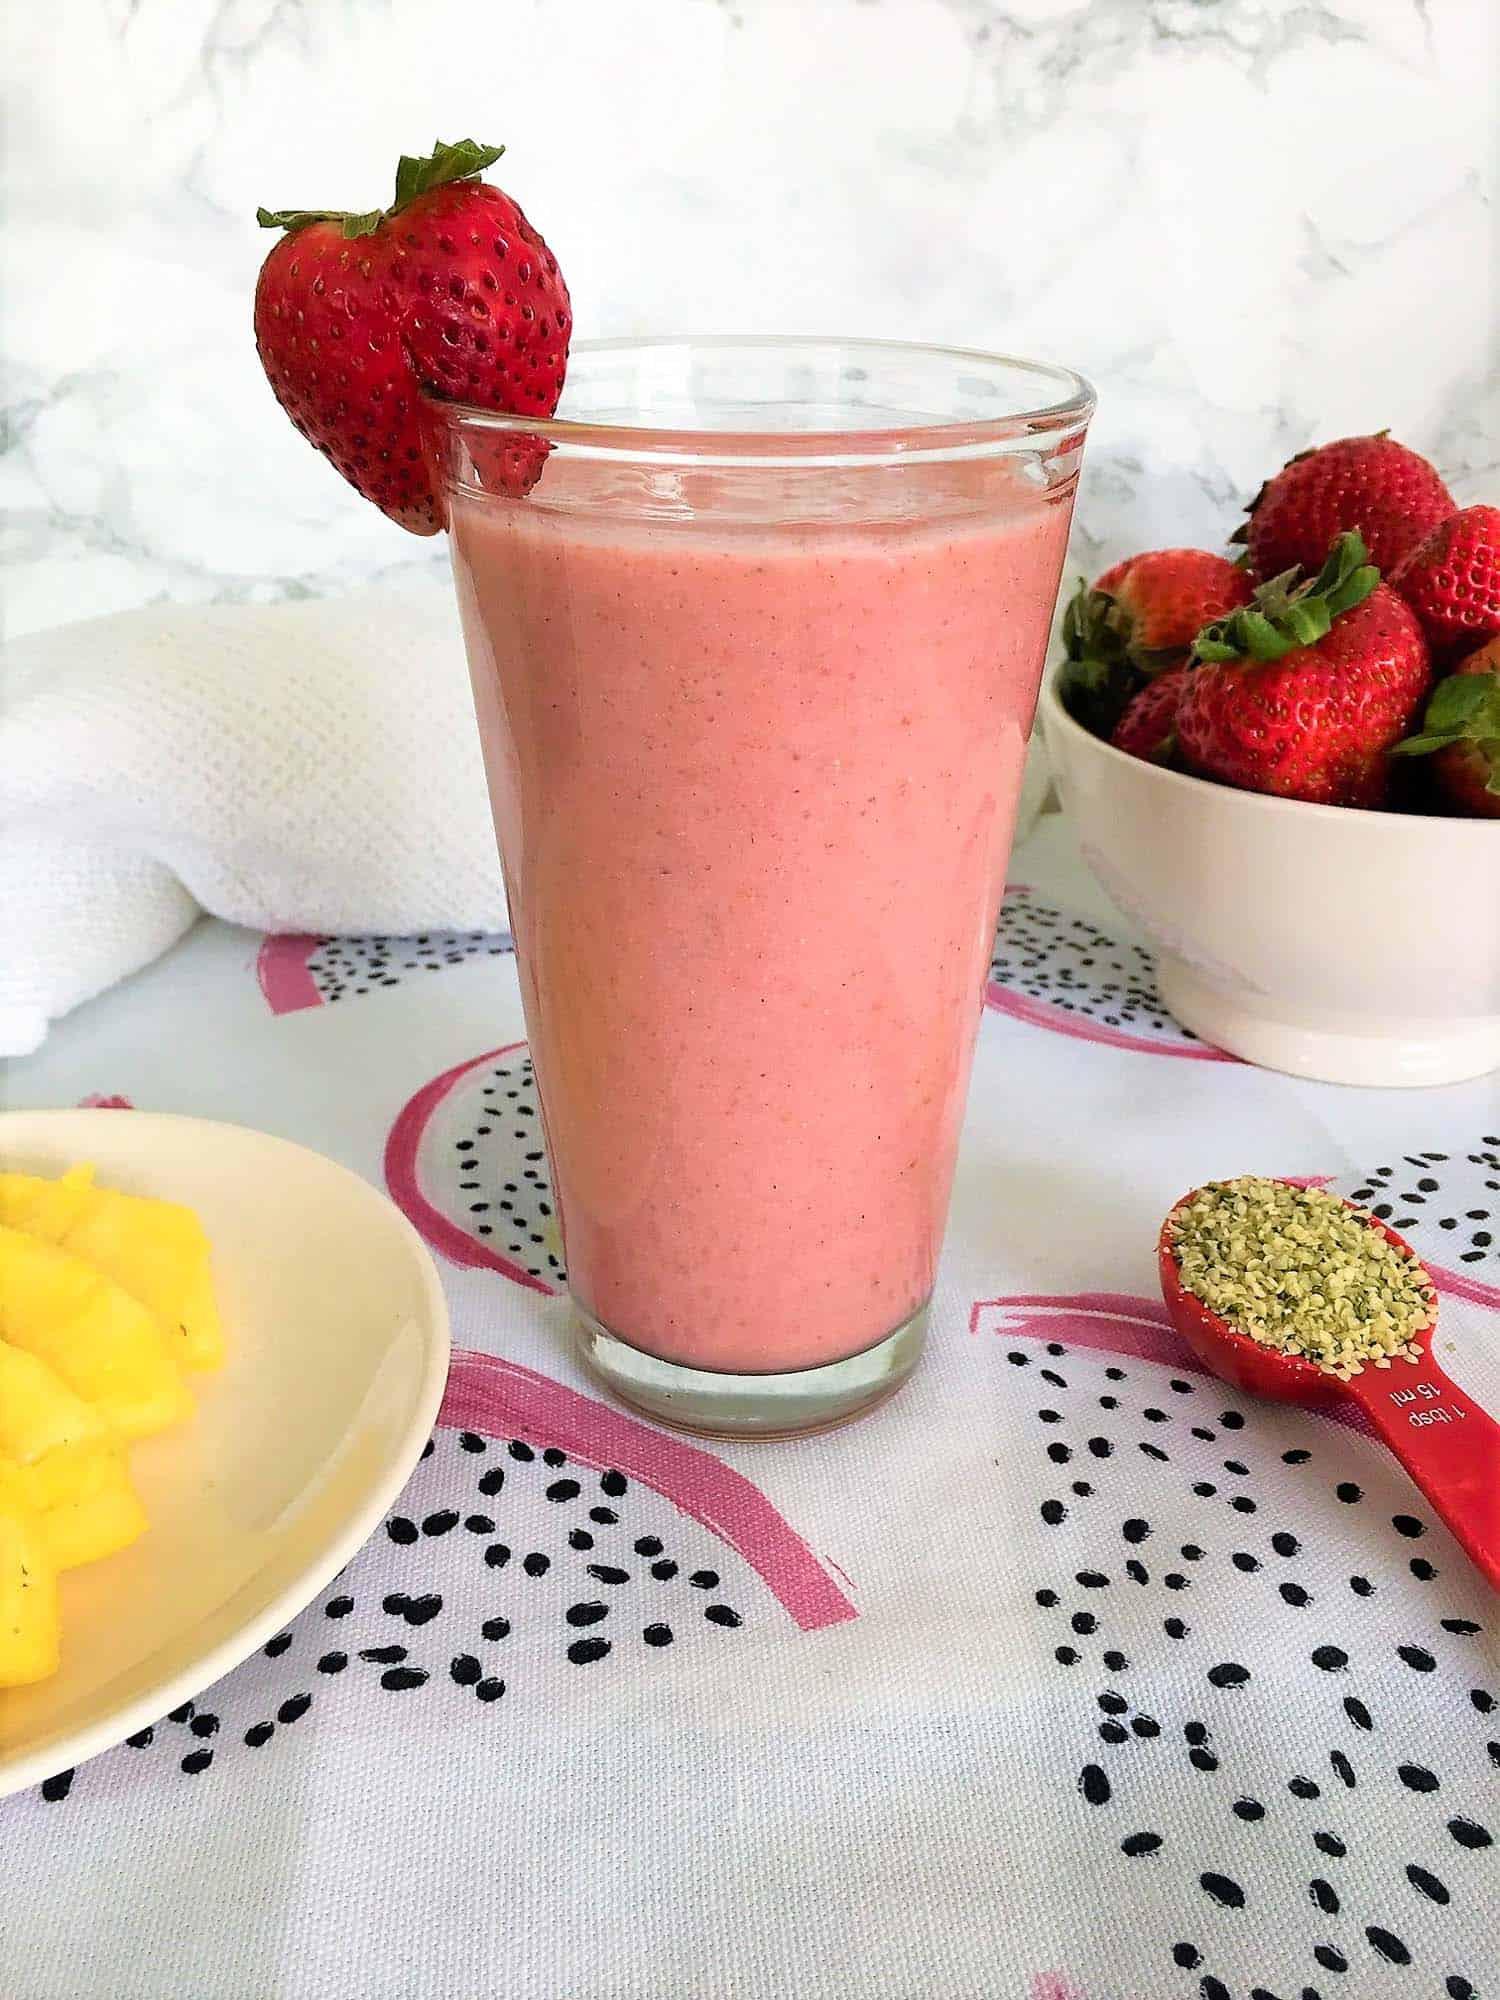 strawberry smoothie with strawberry garnish